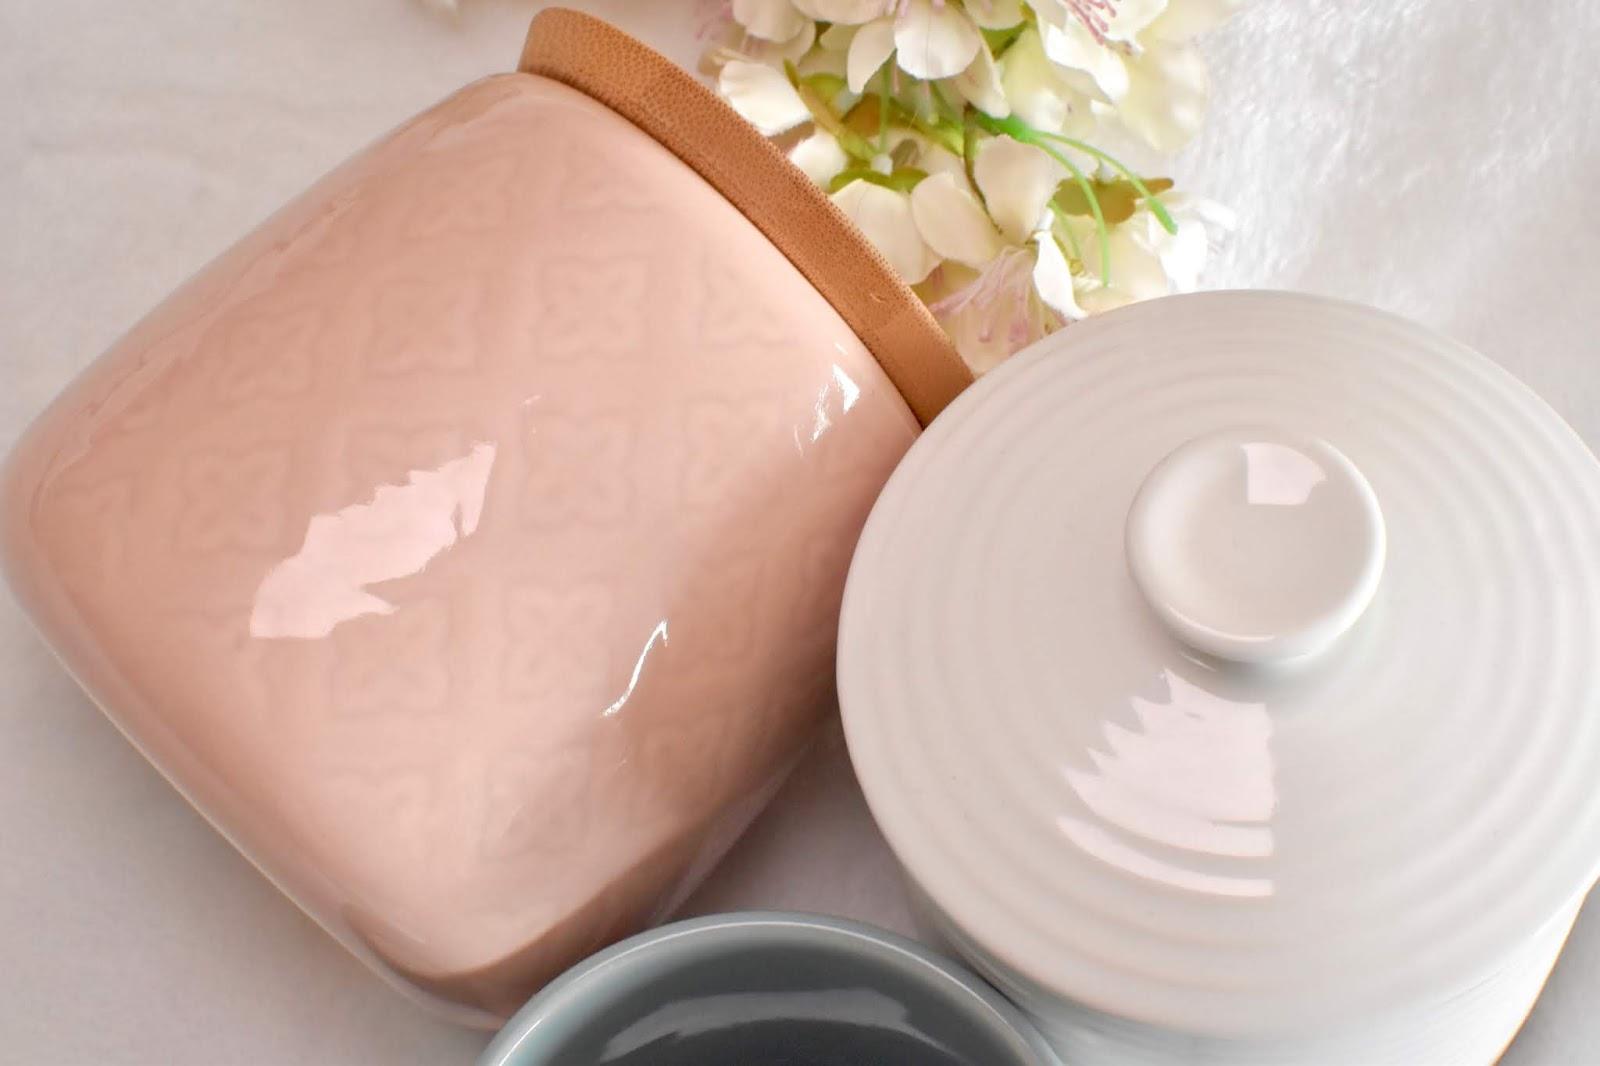 Pink and white mug from TK Maxx